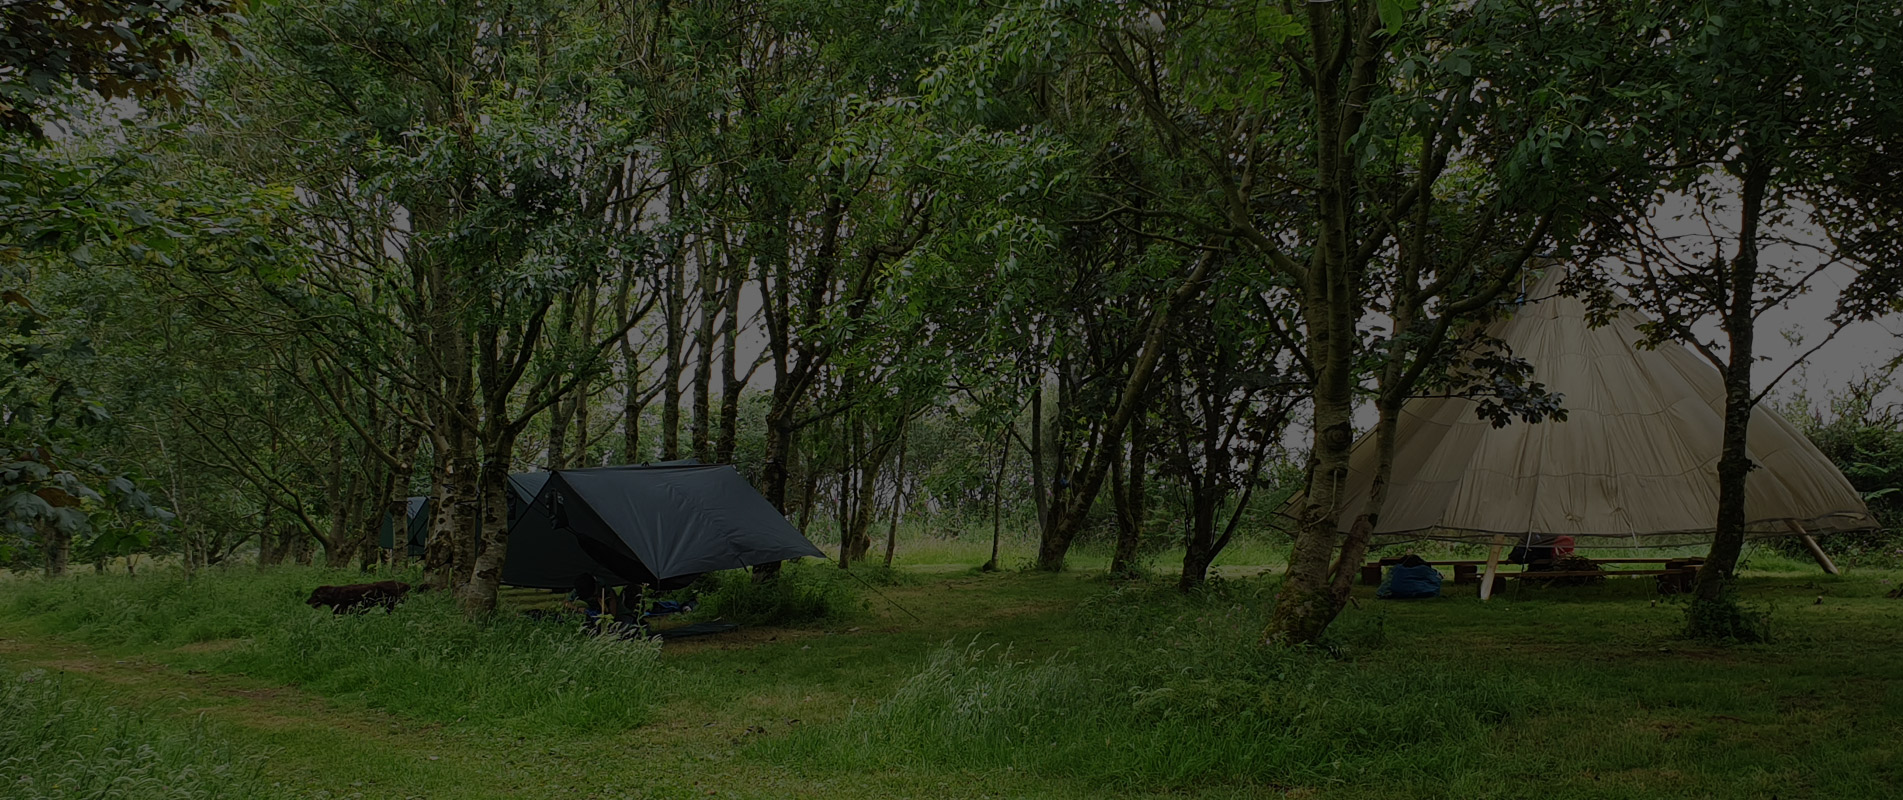 Home - Wildwoodlands, Cornwall